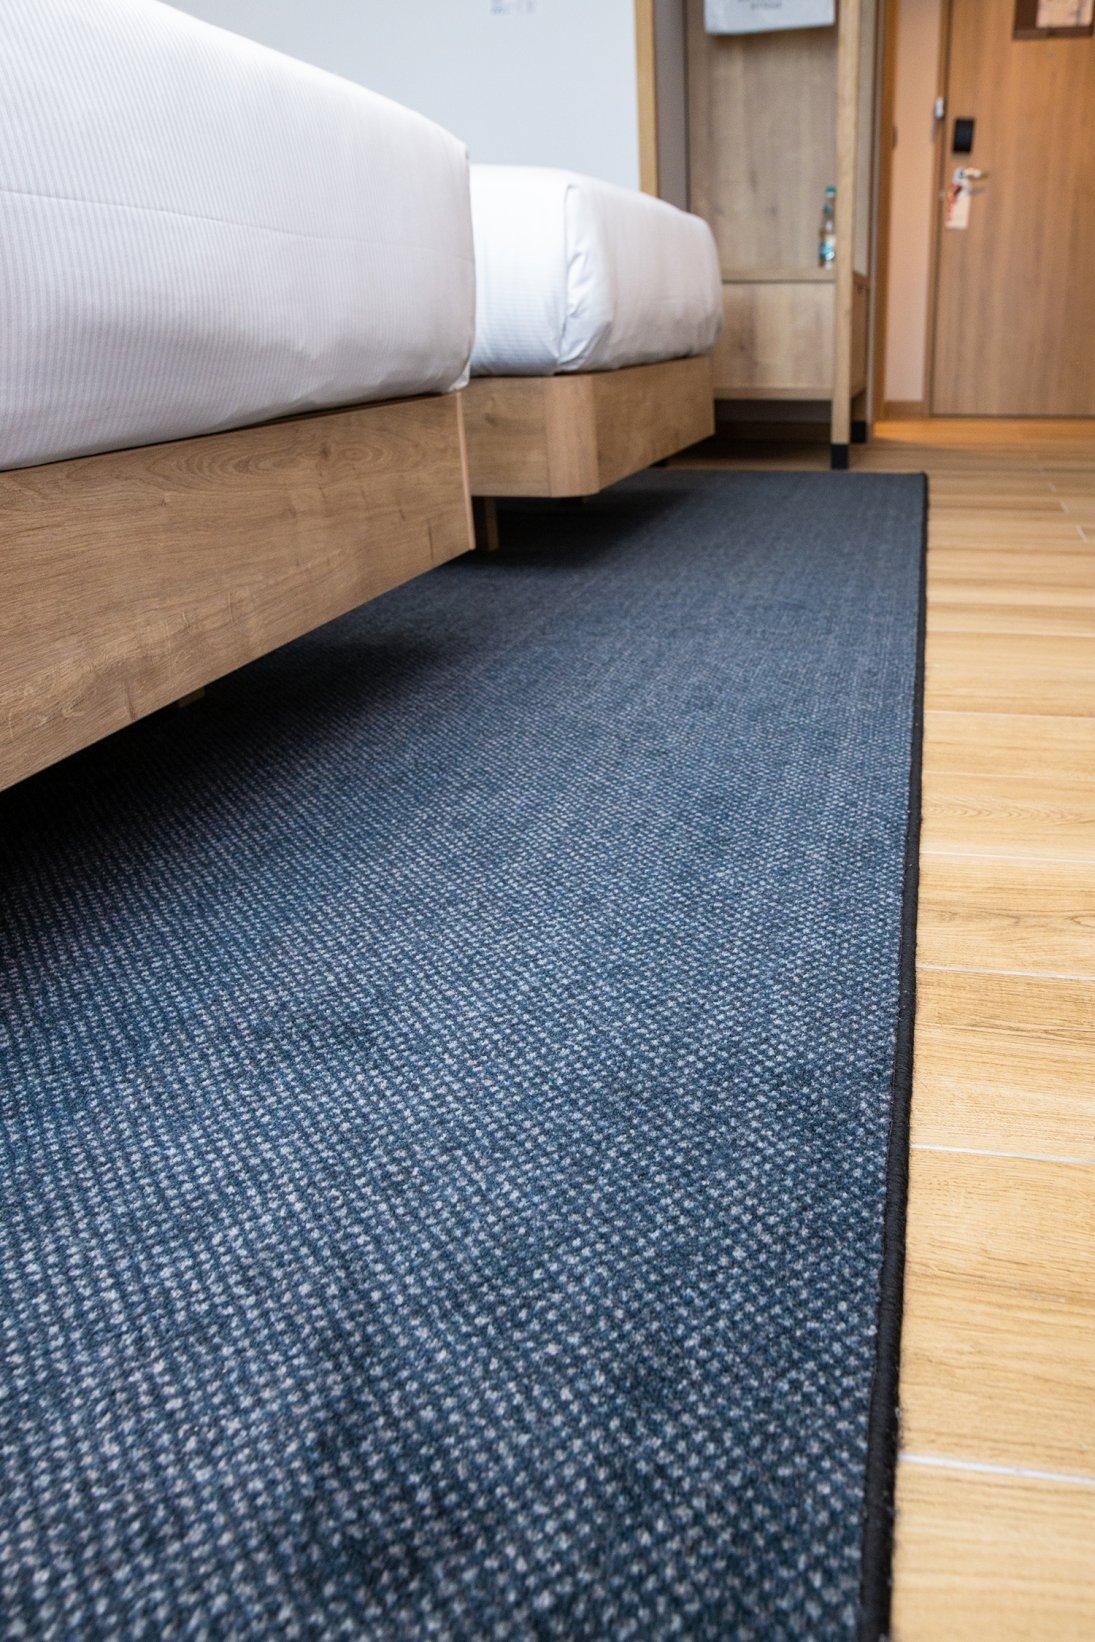 20200625-carpet-and-more-hilton-otopeni-08